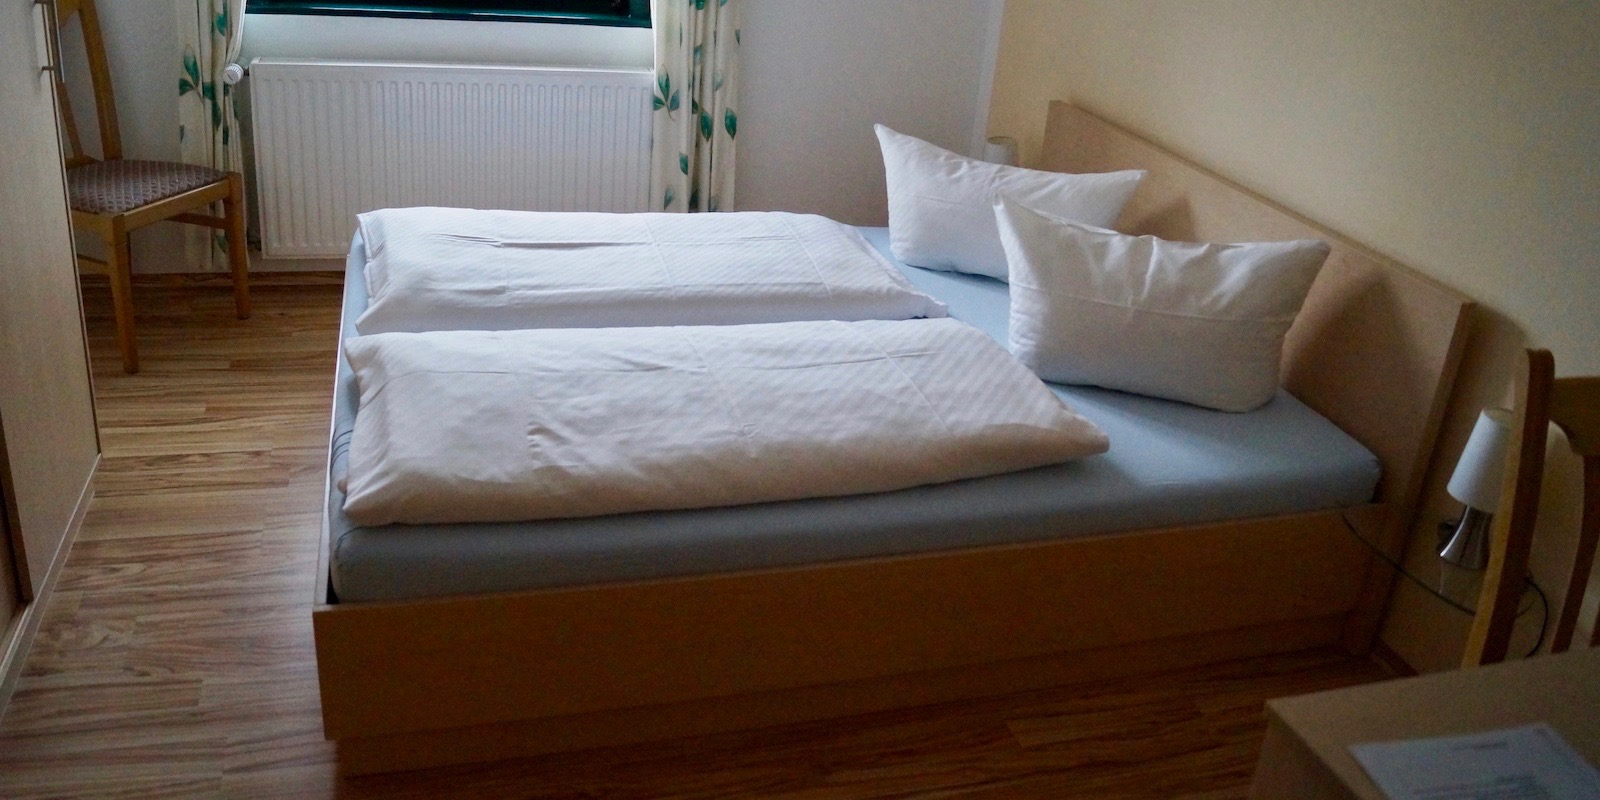 http://hotel-katzenstein.de/wp-content/uploads/2017/08/DZ_Classic_Bett8x4.jpg